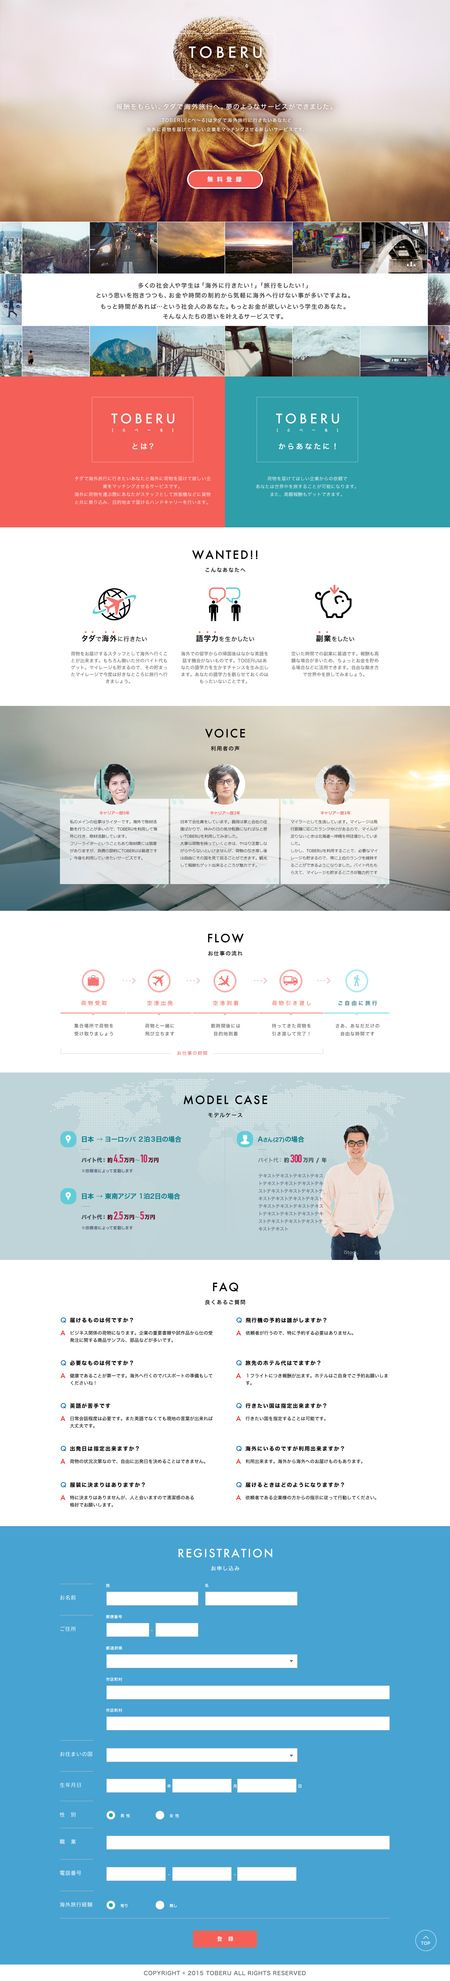 ahumさんの提案 - ハンドキャリーサービスサイトのランディングページのデザイン | クラウドソーシング「ランサーズ」